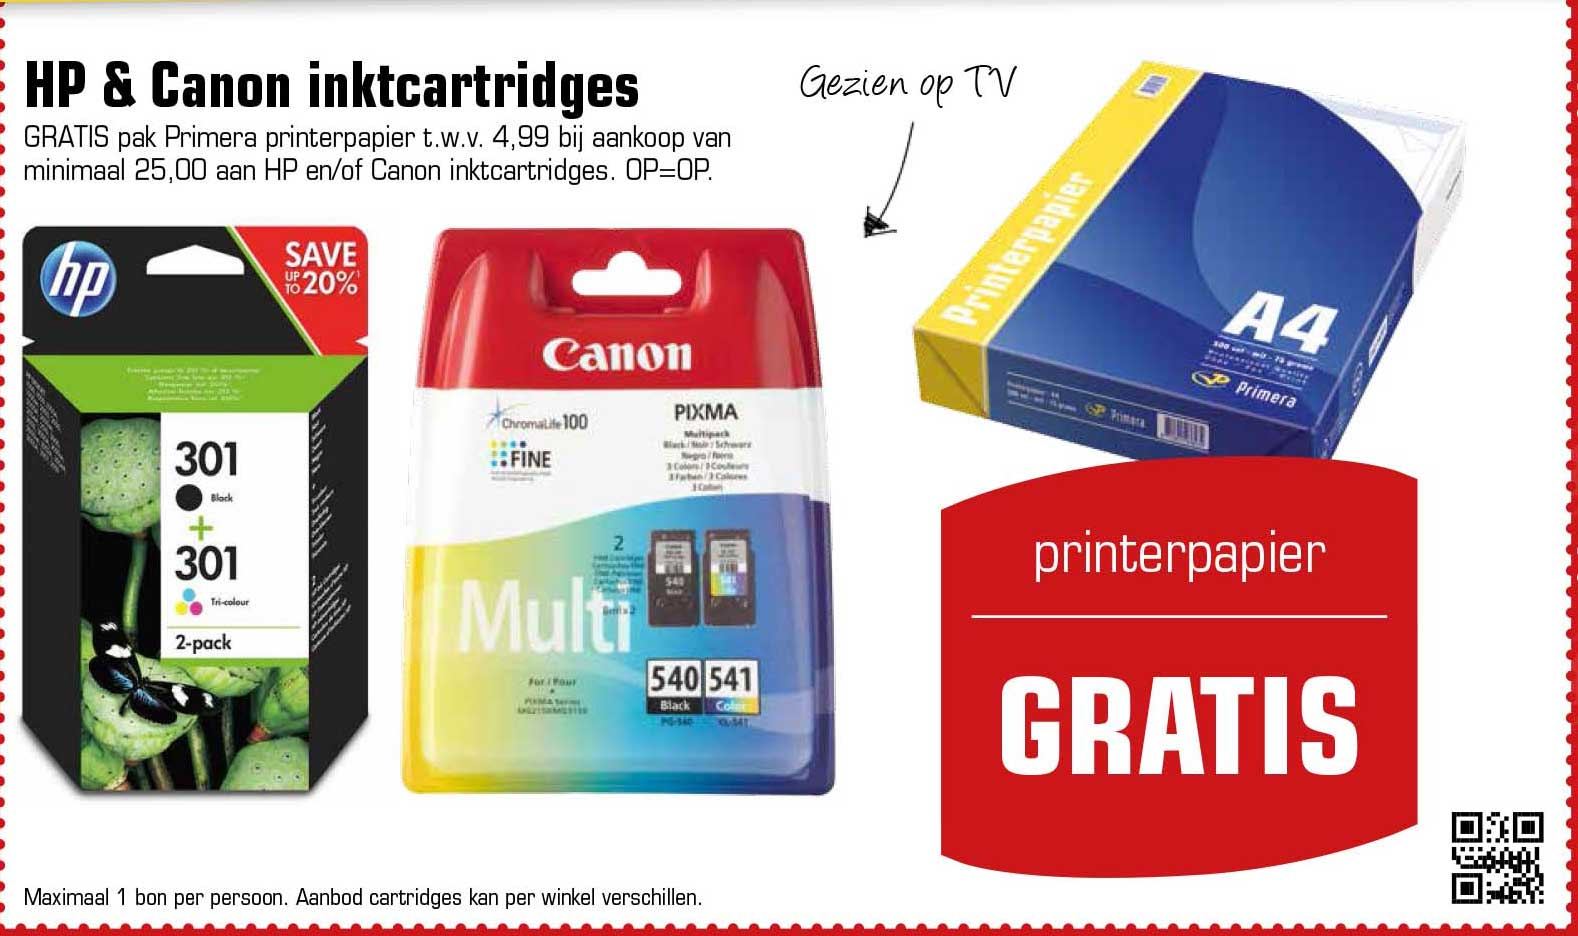 Primera HP & Canon Inktcartridges